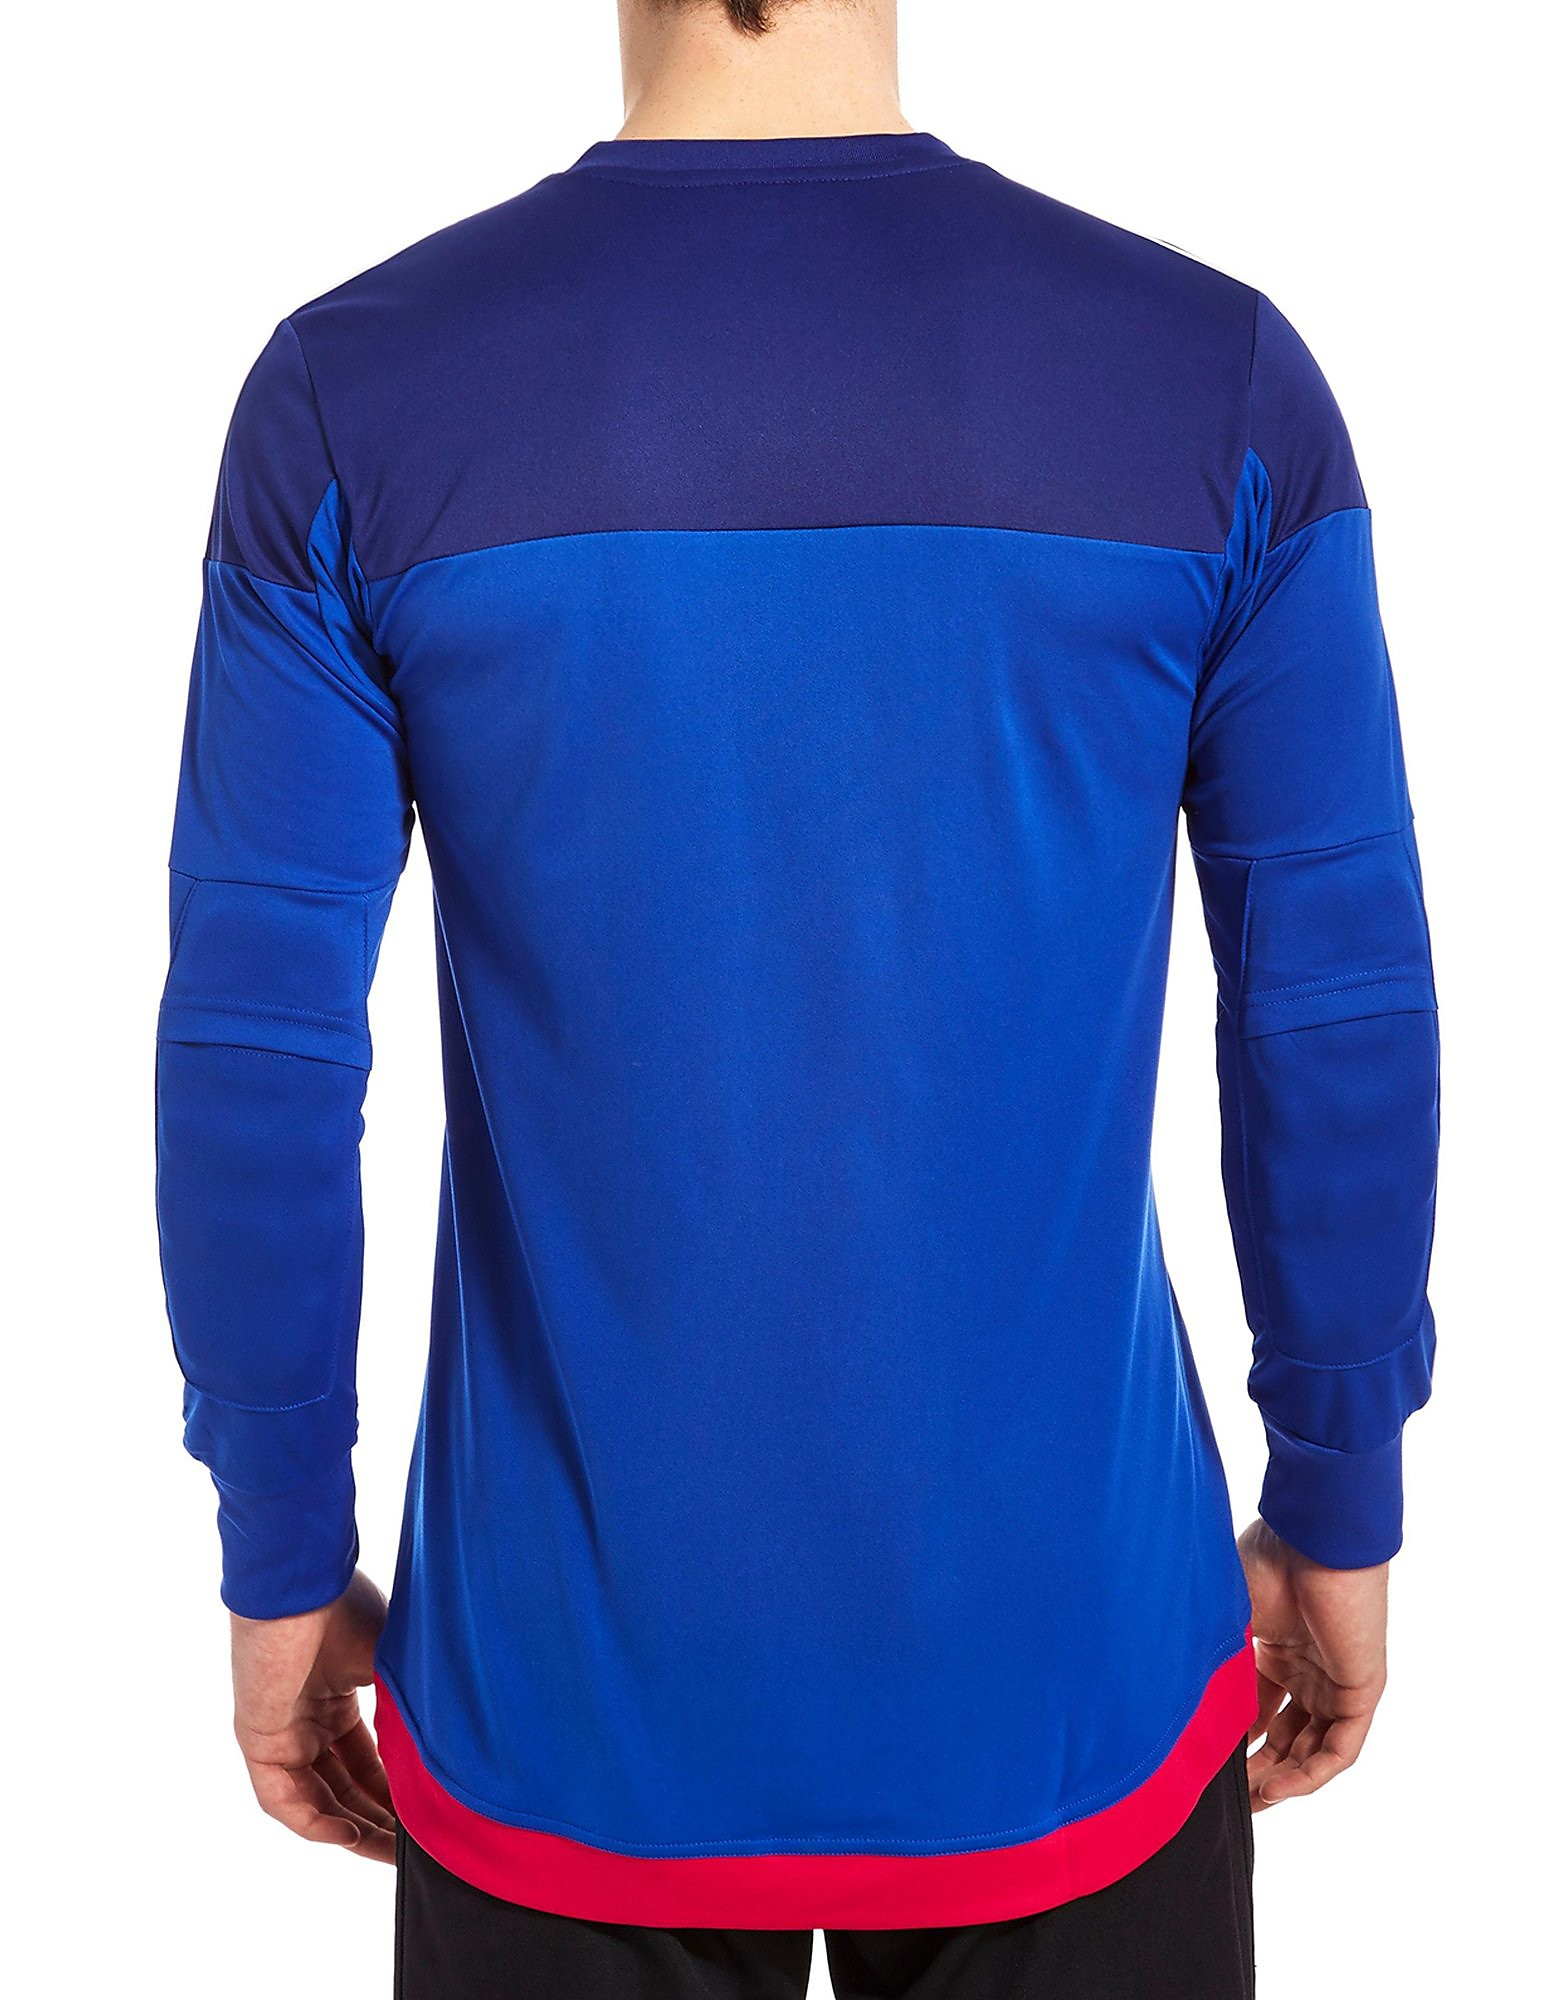 adidas FA Wales Away 2016 Goalkeeper Shirt